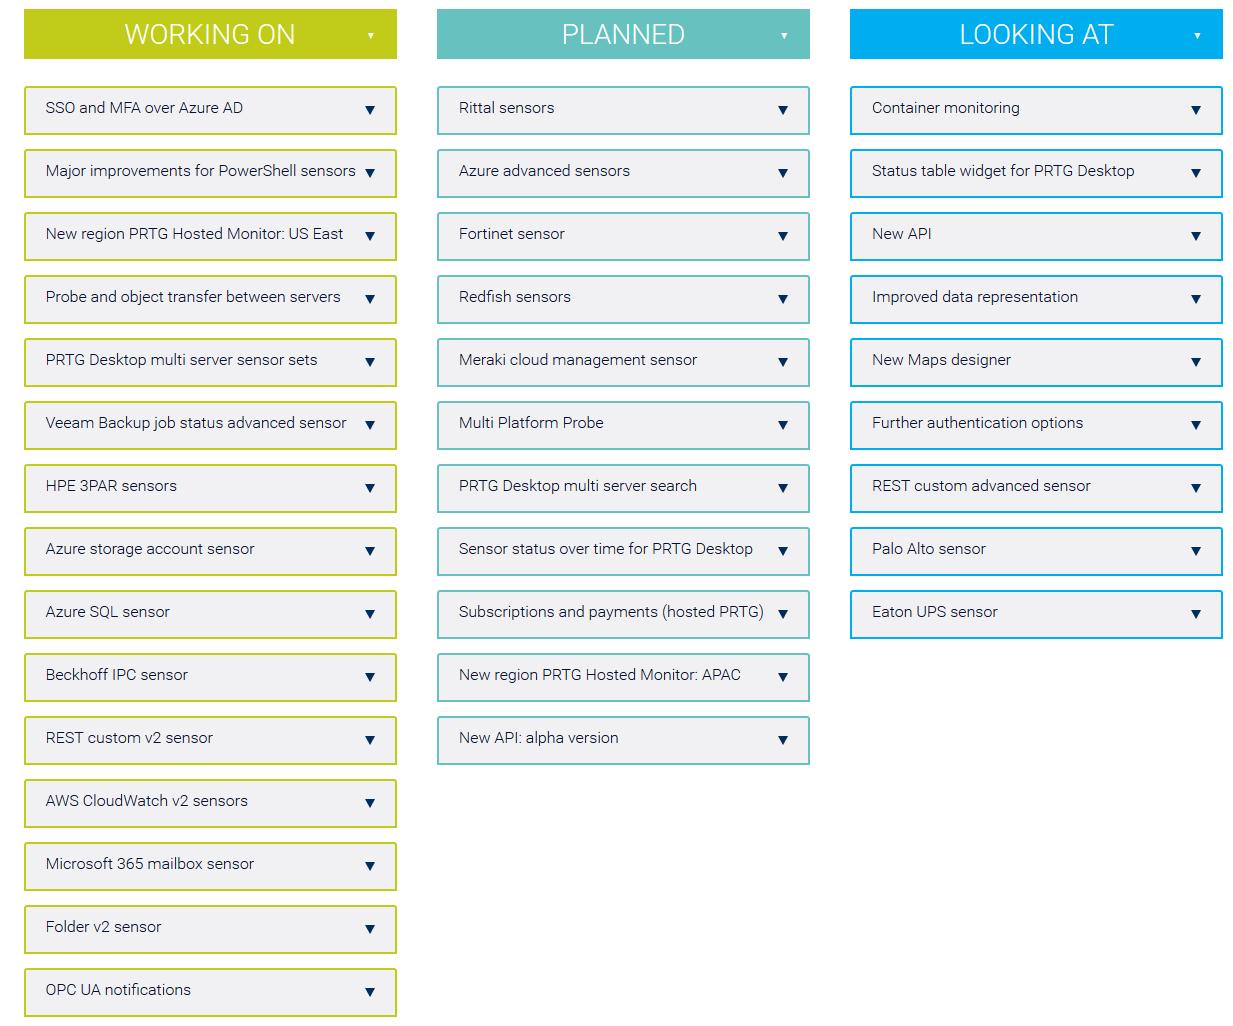 prtg-public-roadmap-april-2021